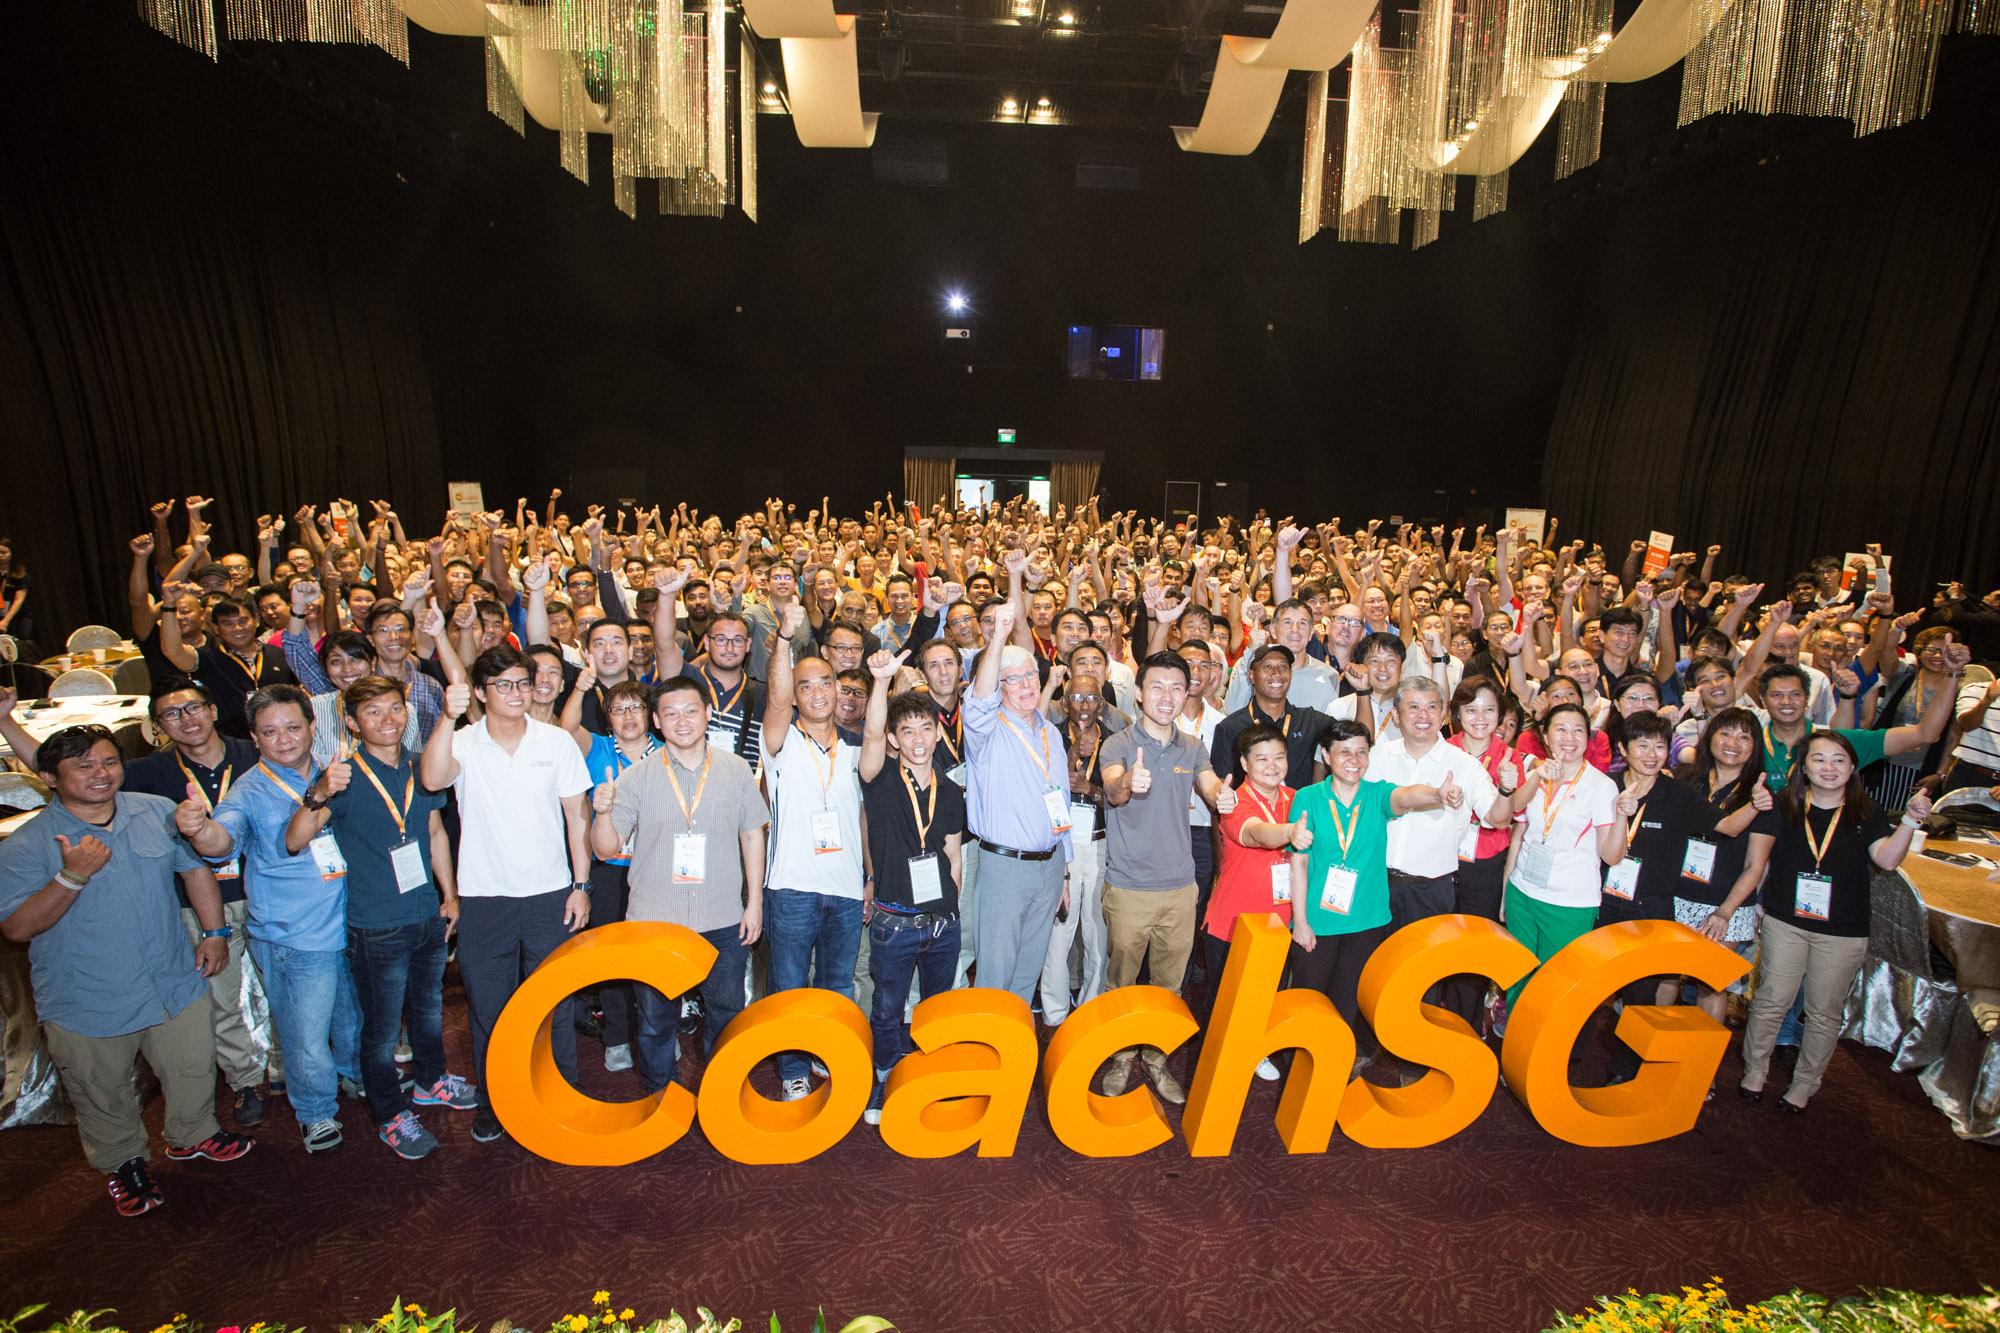 SportSG_CoachSG_Conference-7.jpg